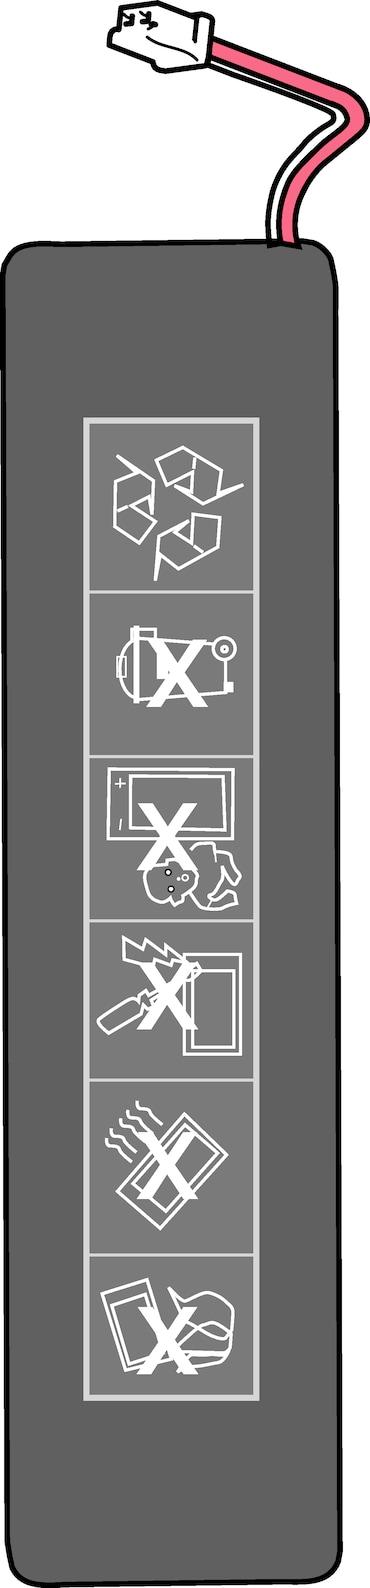 Image – 4861601000, Xplorer/Xplorer plus, Li-polymer accumulator